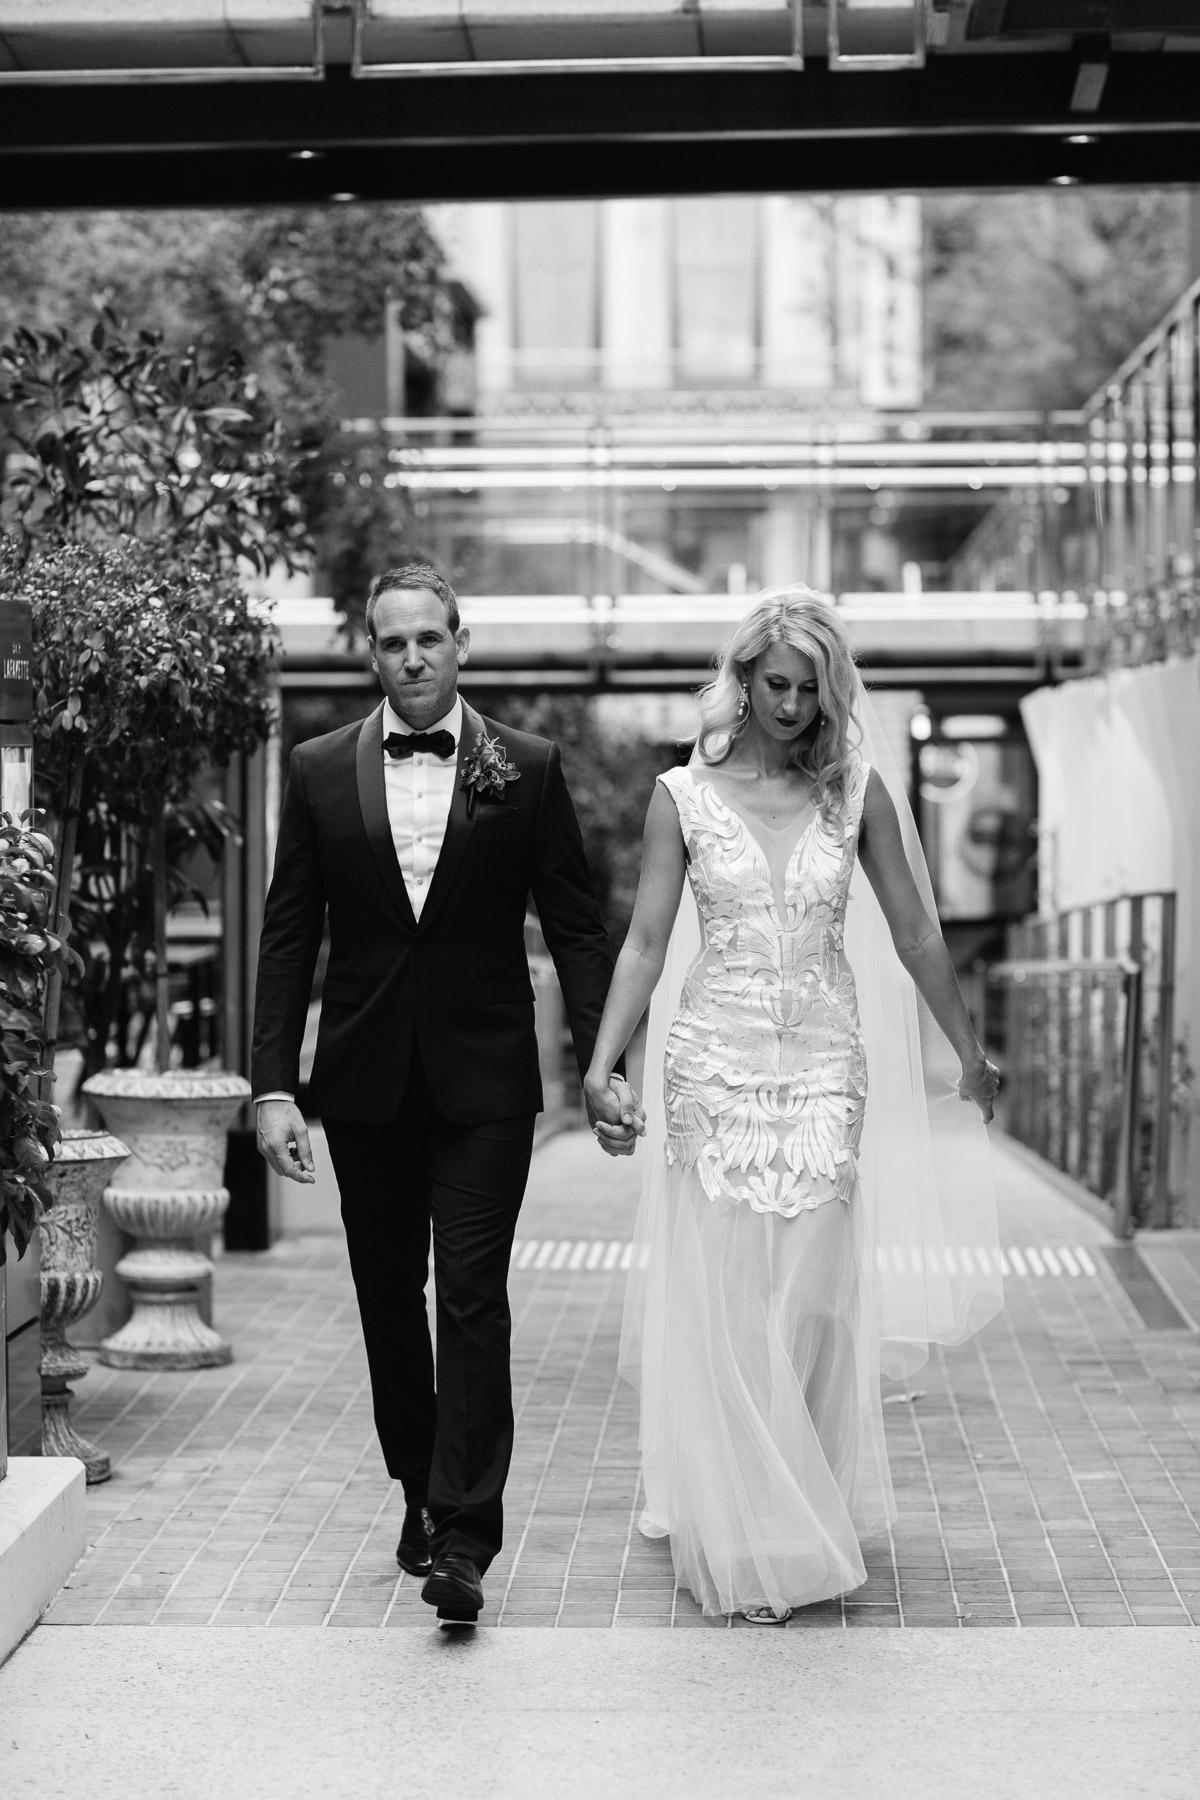 Jess + Jason-The Flour Factory wedding-65.jpg